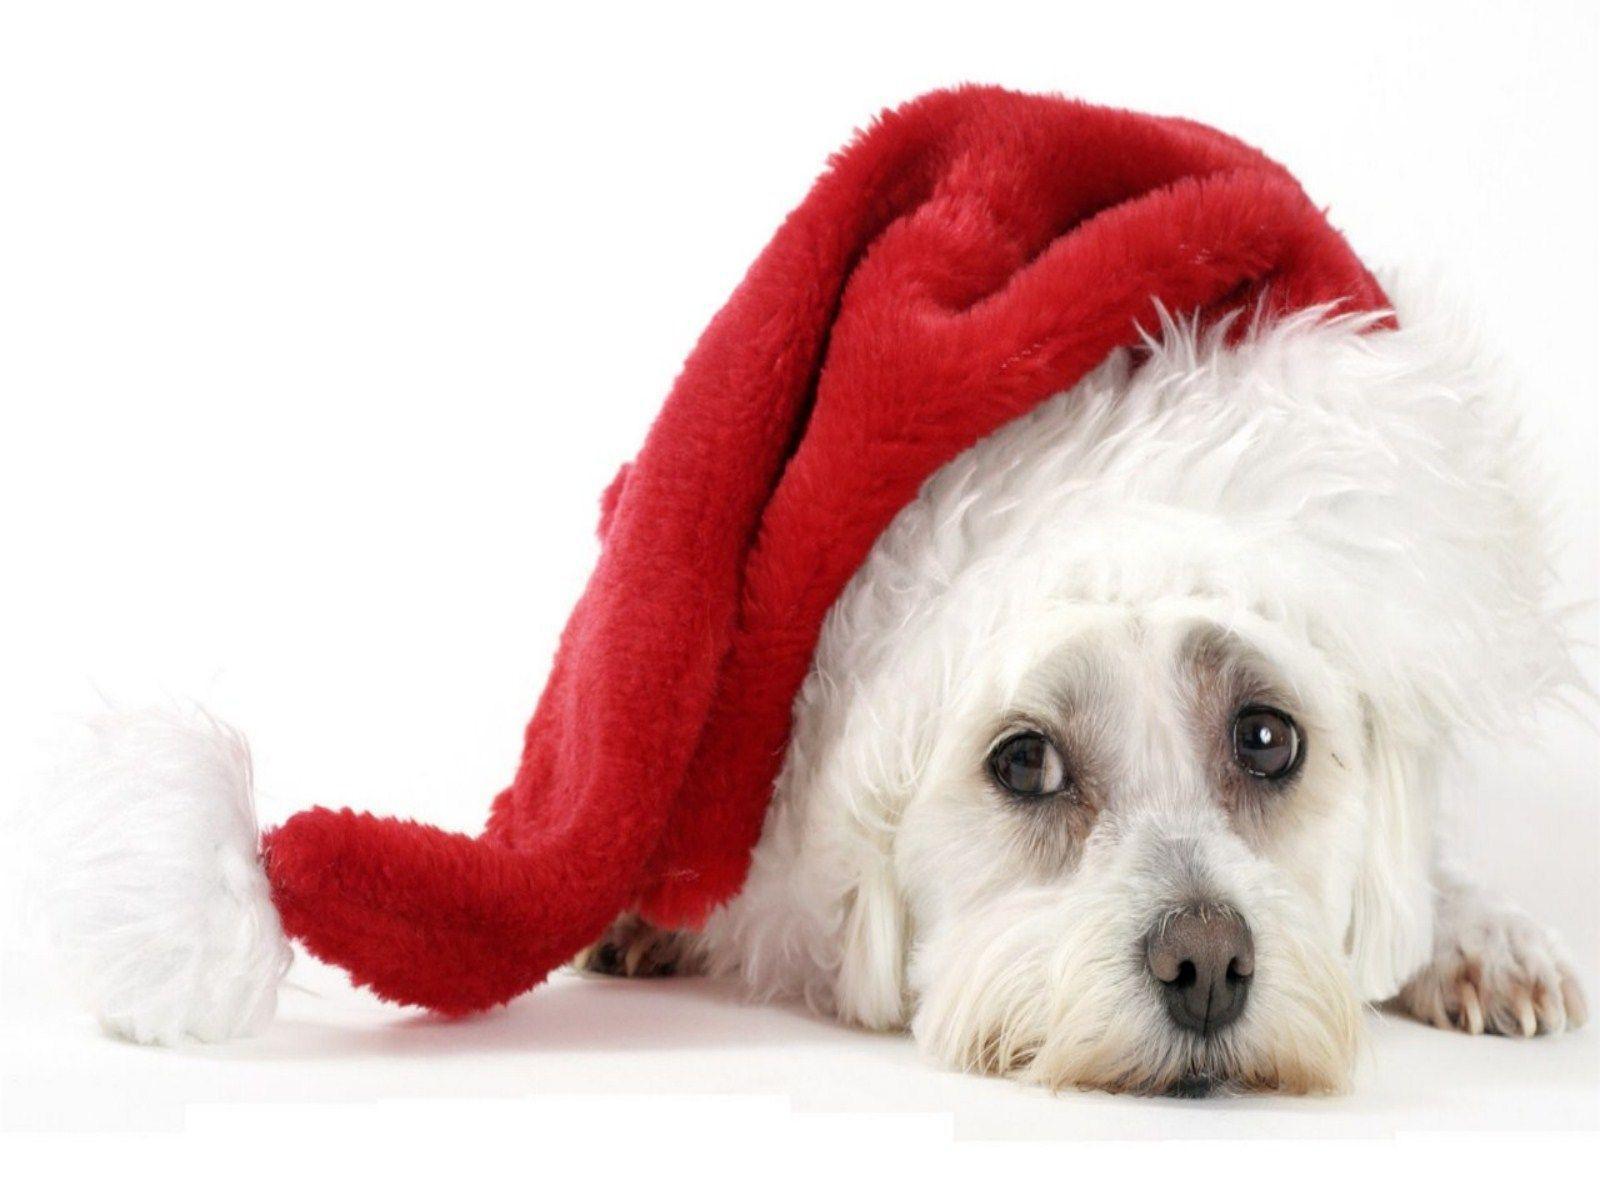 christmas puppy wallpaper - photo #30